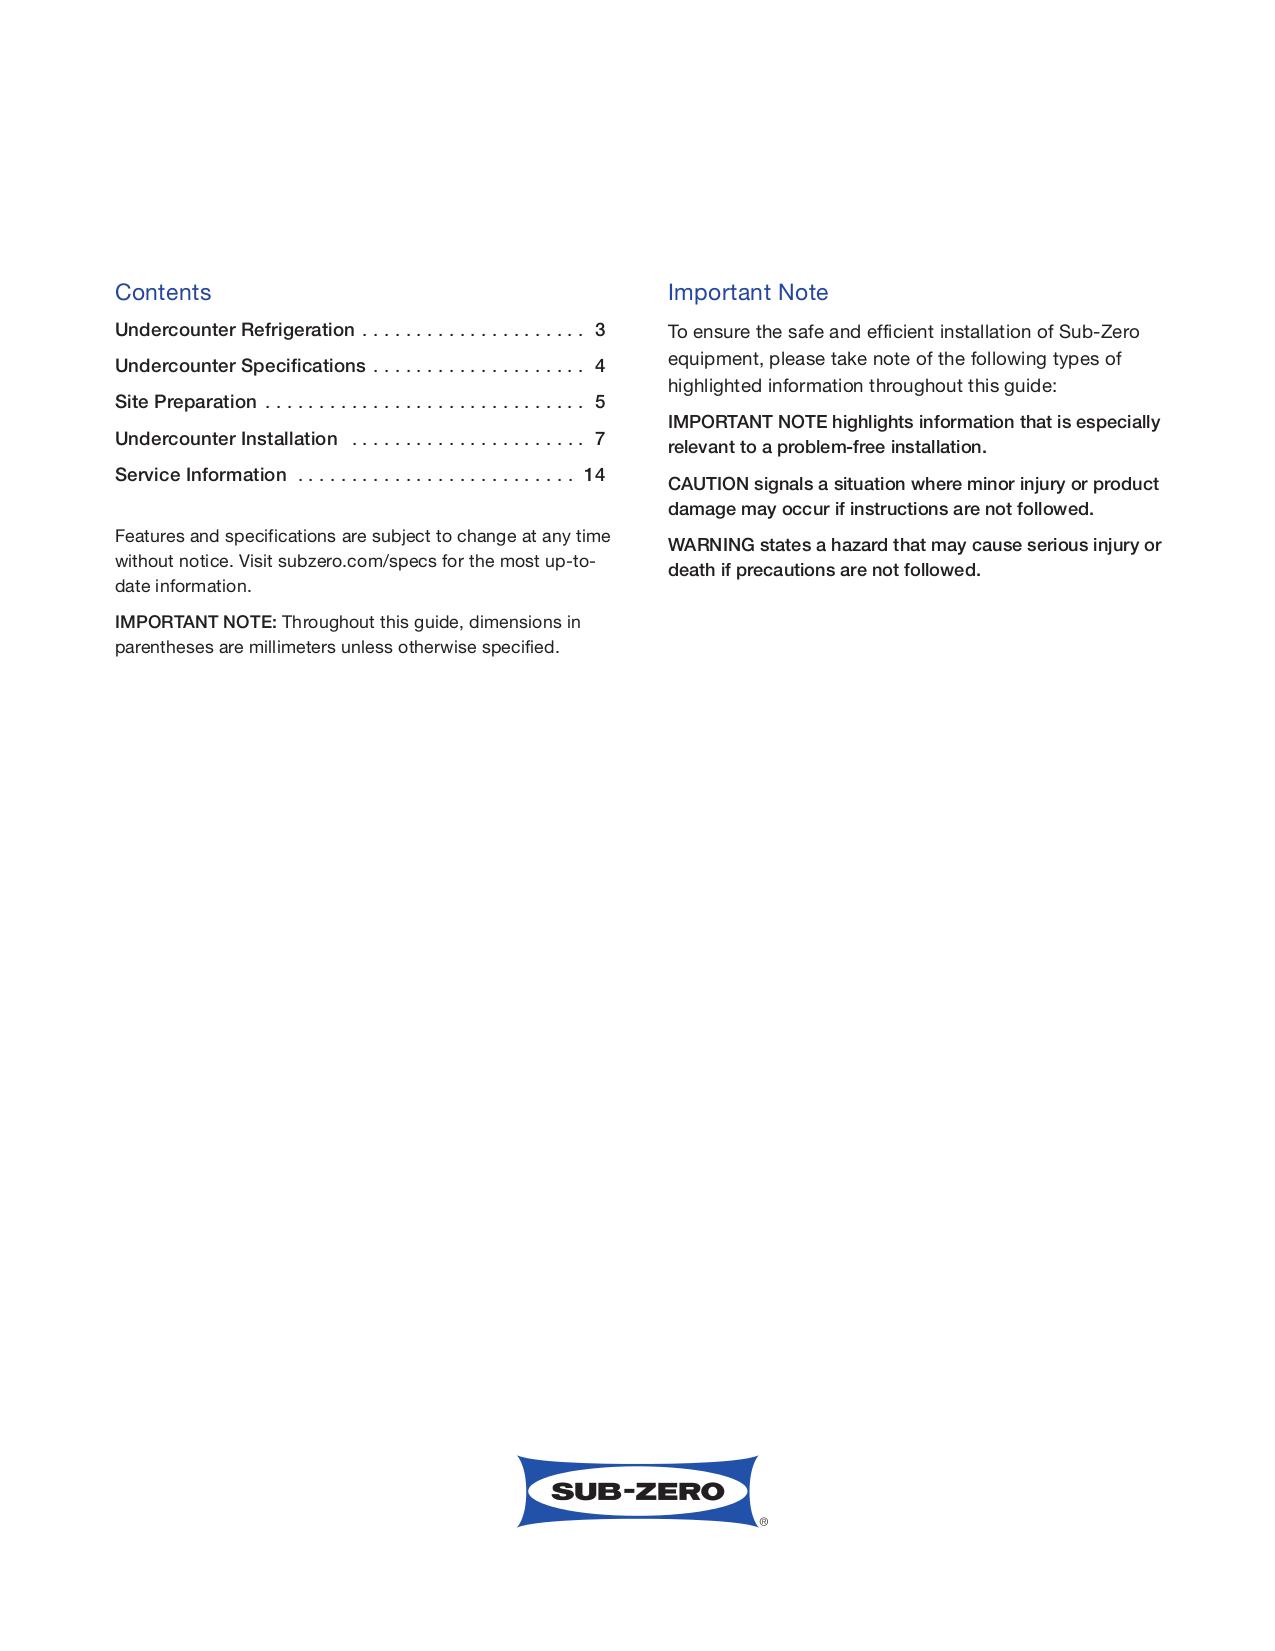 PDF manual for Wolf Refrigerator Sub-Zero UC-24C on